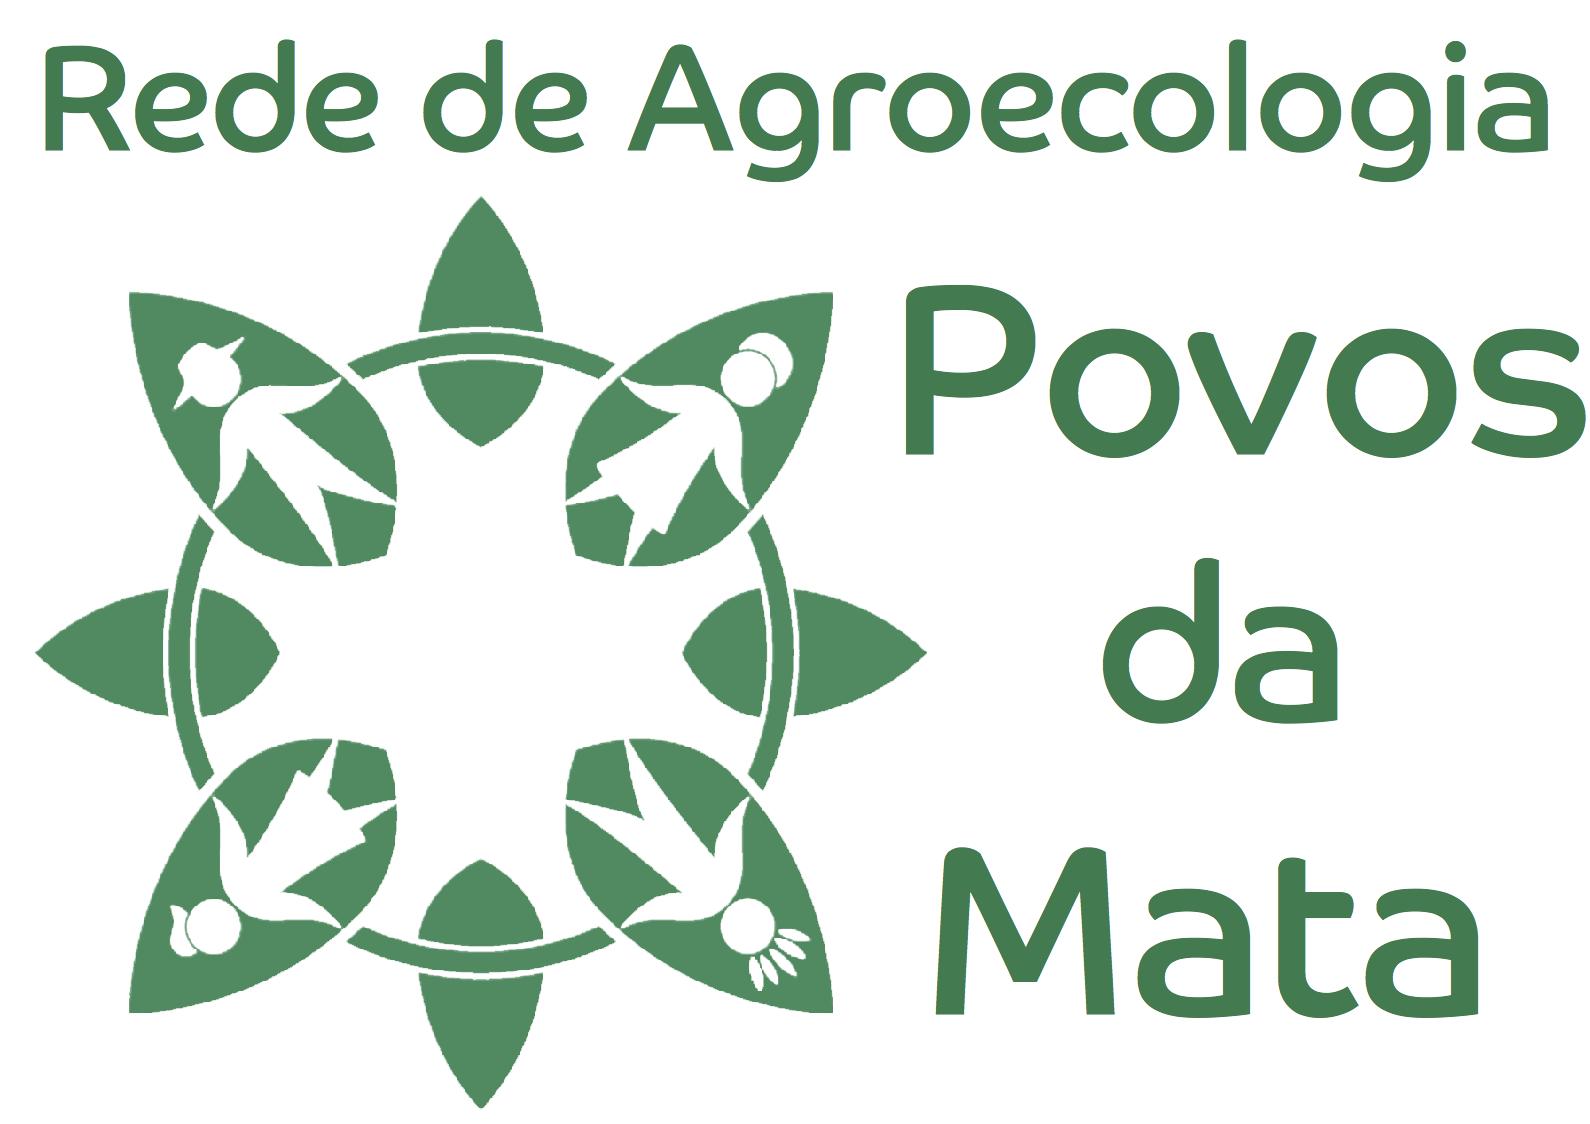 Povos da Mata Rede de Agroecologia logo